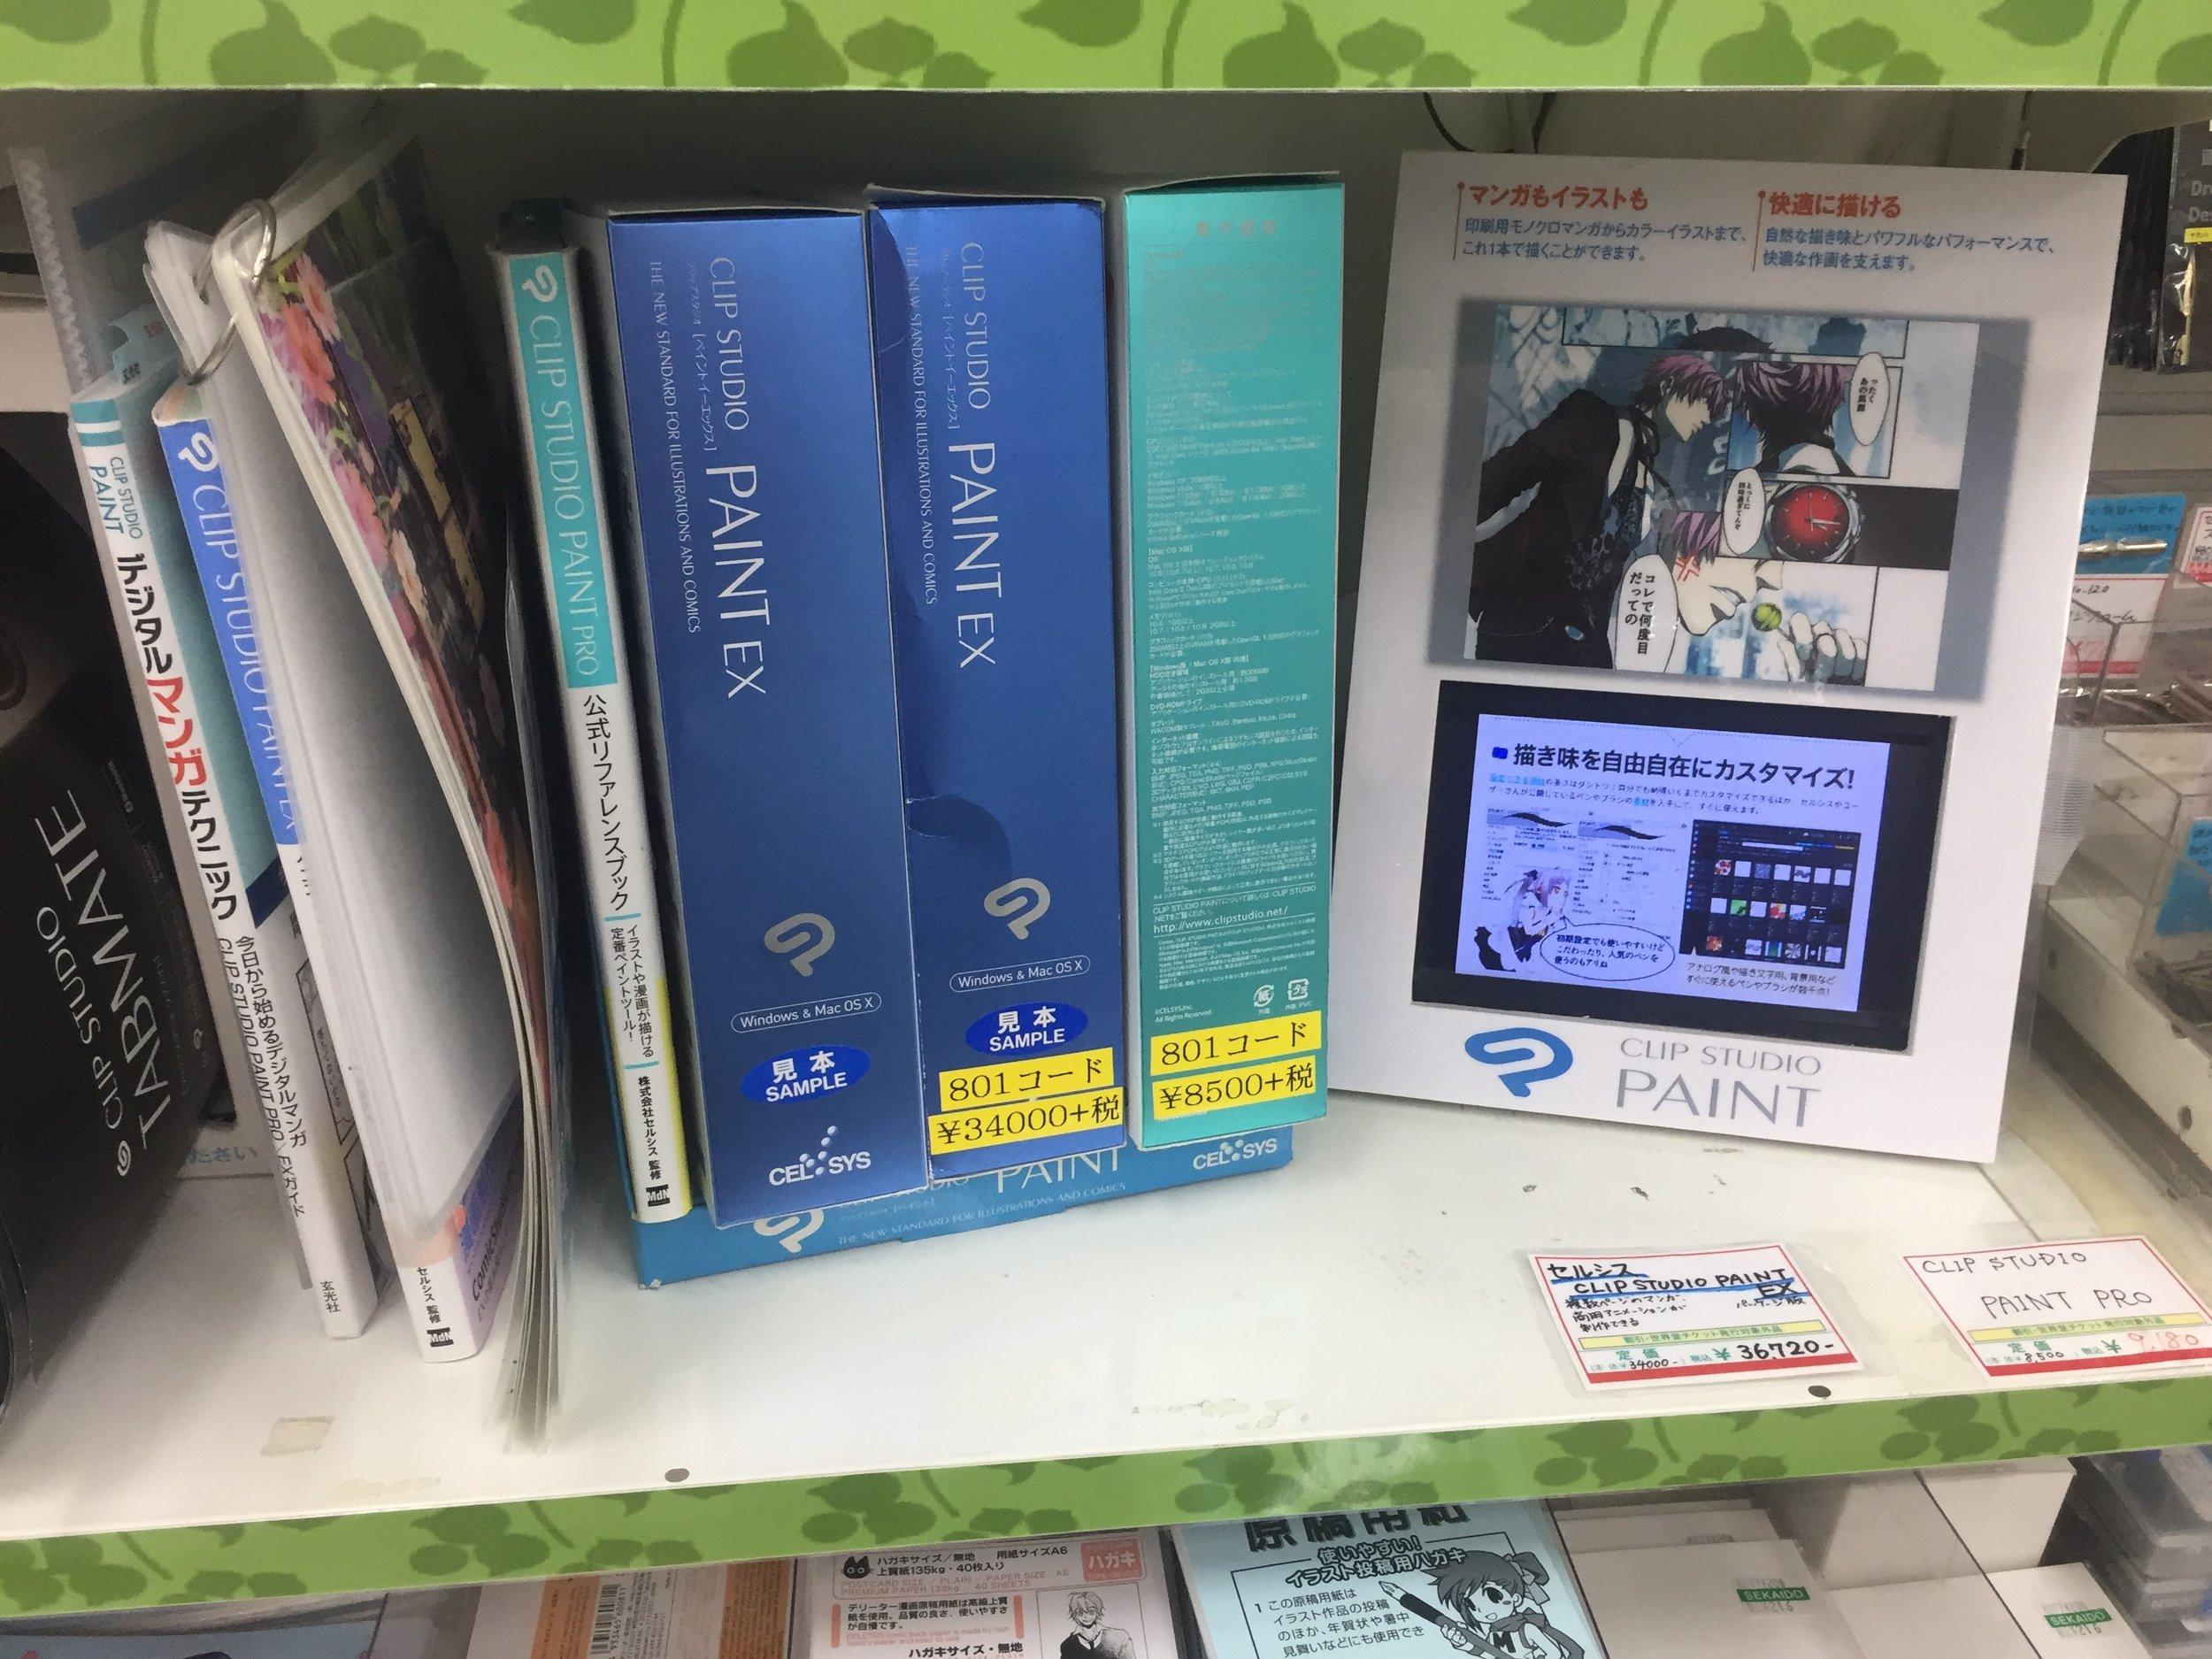 Clip Studio Paint Retail Display Sekaido tokyo japan.JPG